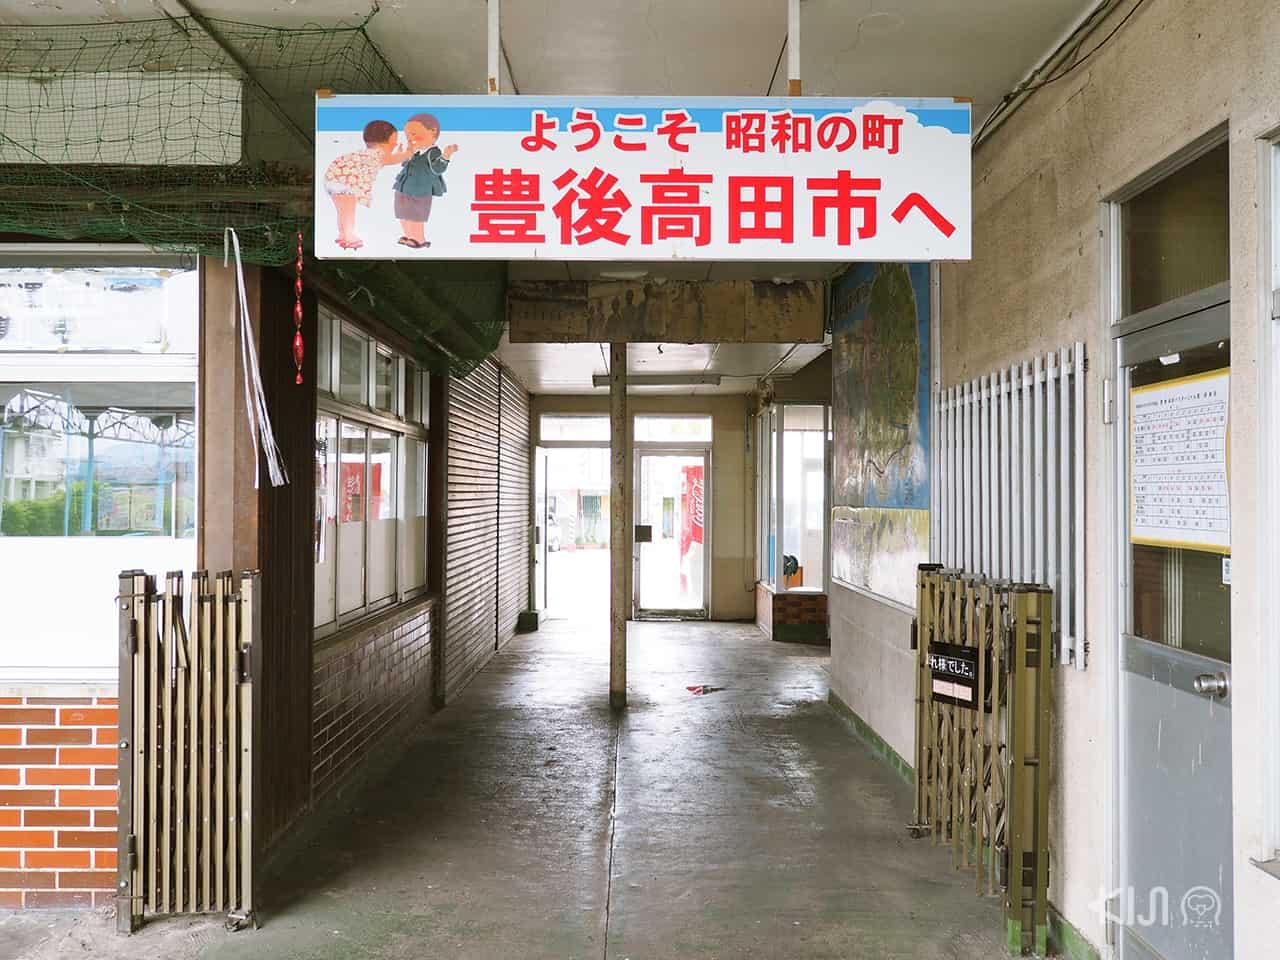 Showa Retro Town เมืองบุงโกะทาคาดะ (Bungotakada)